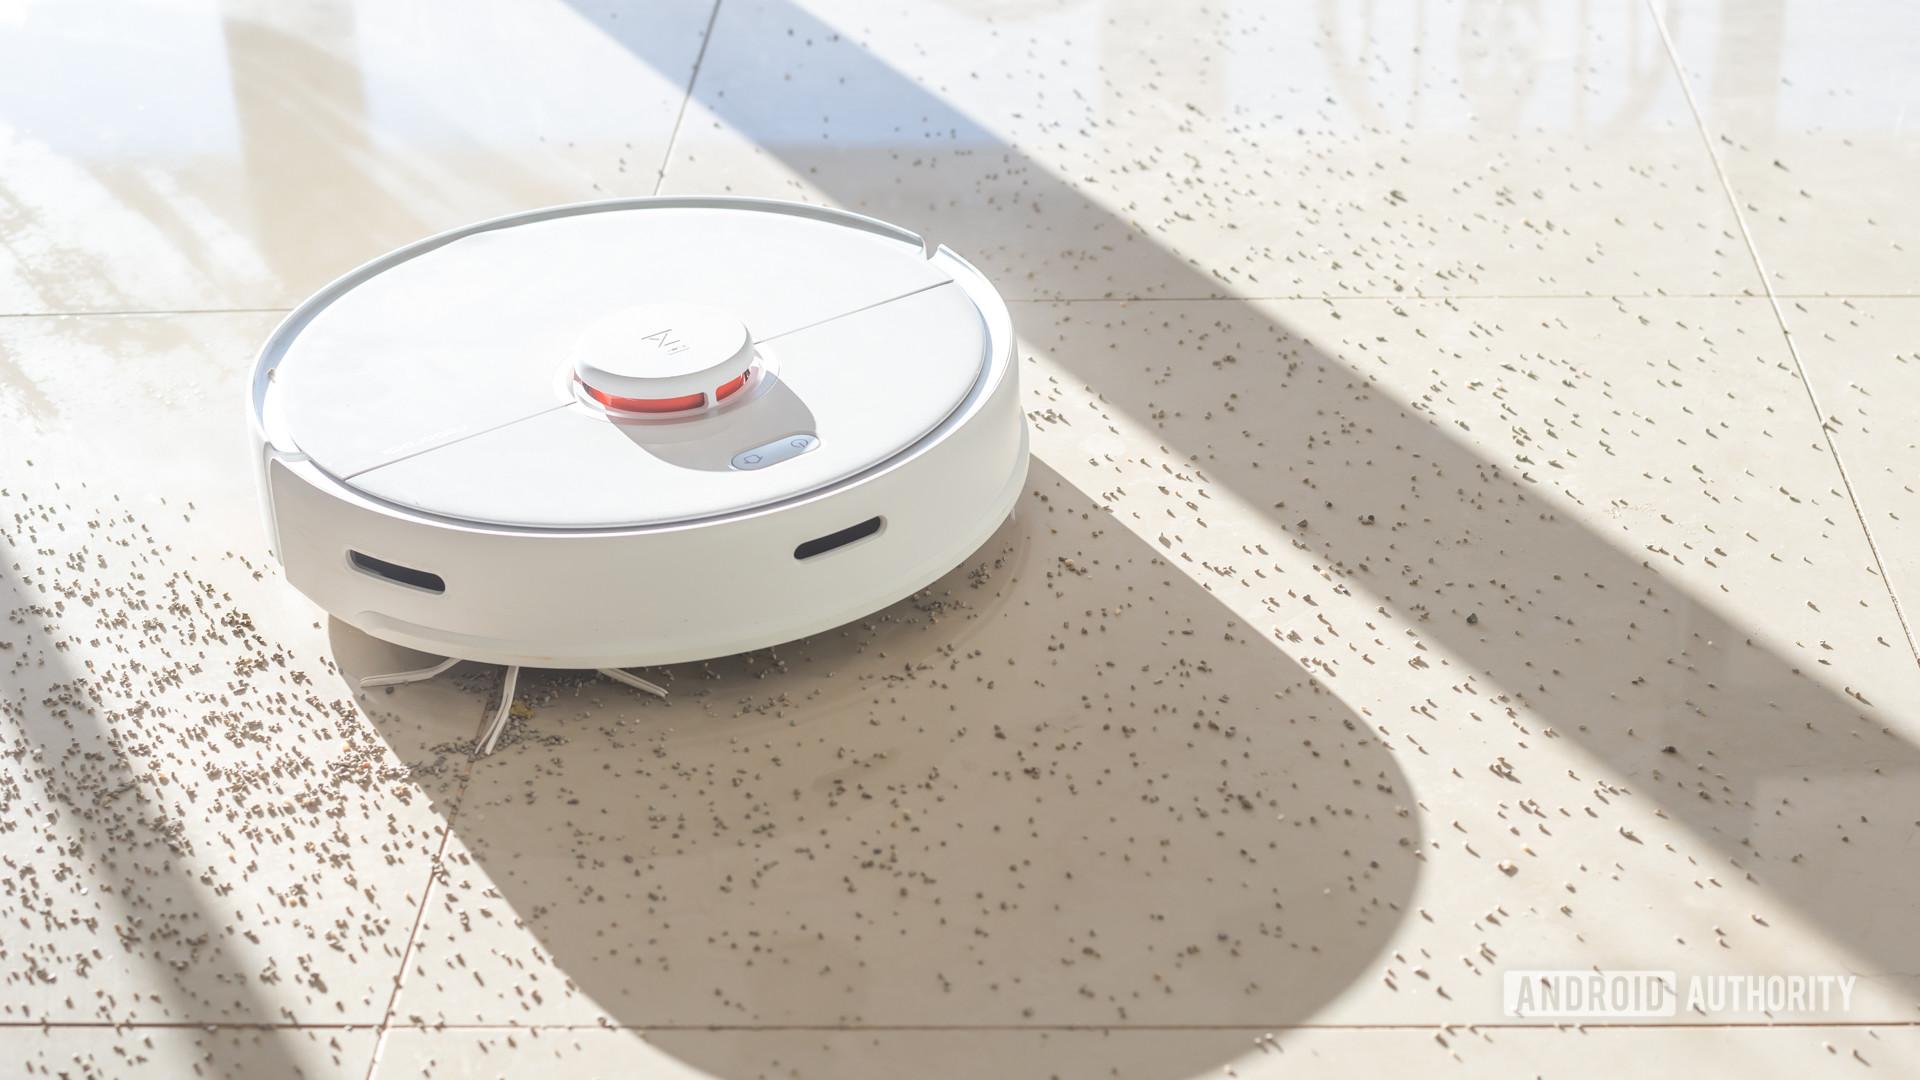 Roborock S5 Max robot vacuum cleaning dirt 14